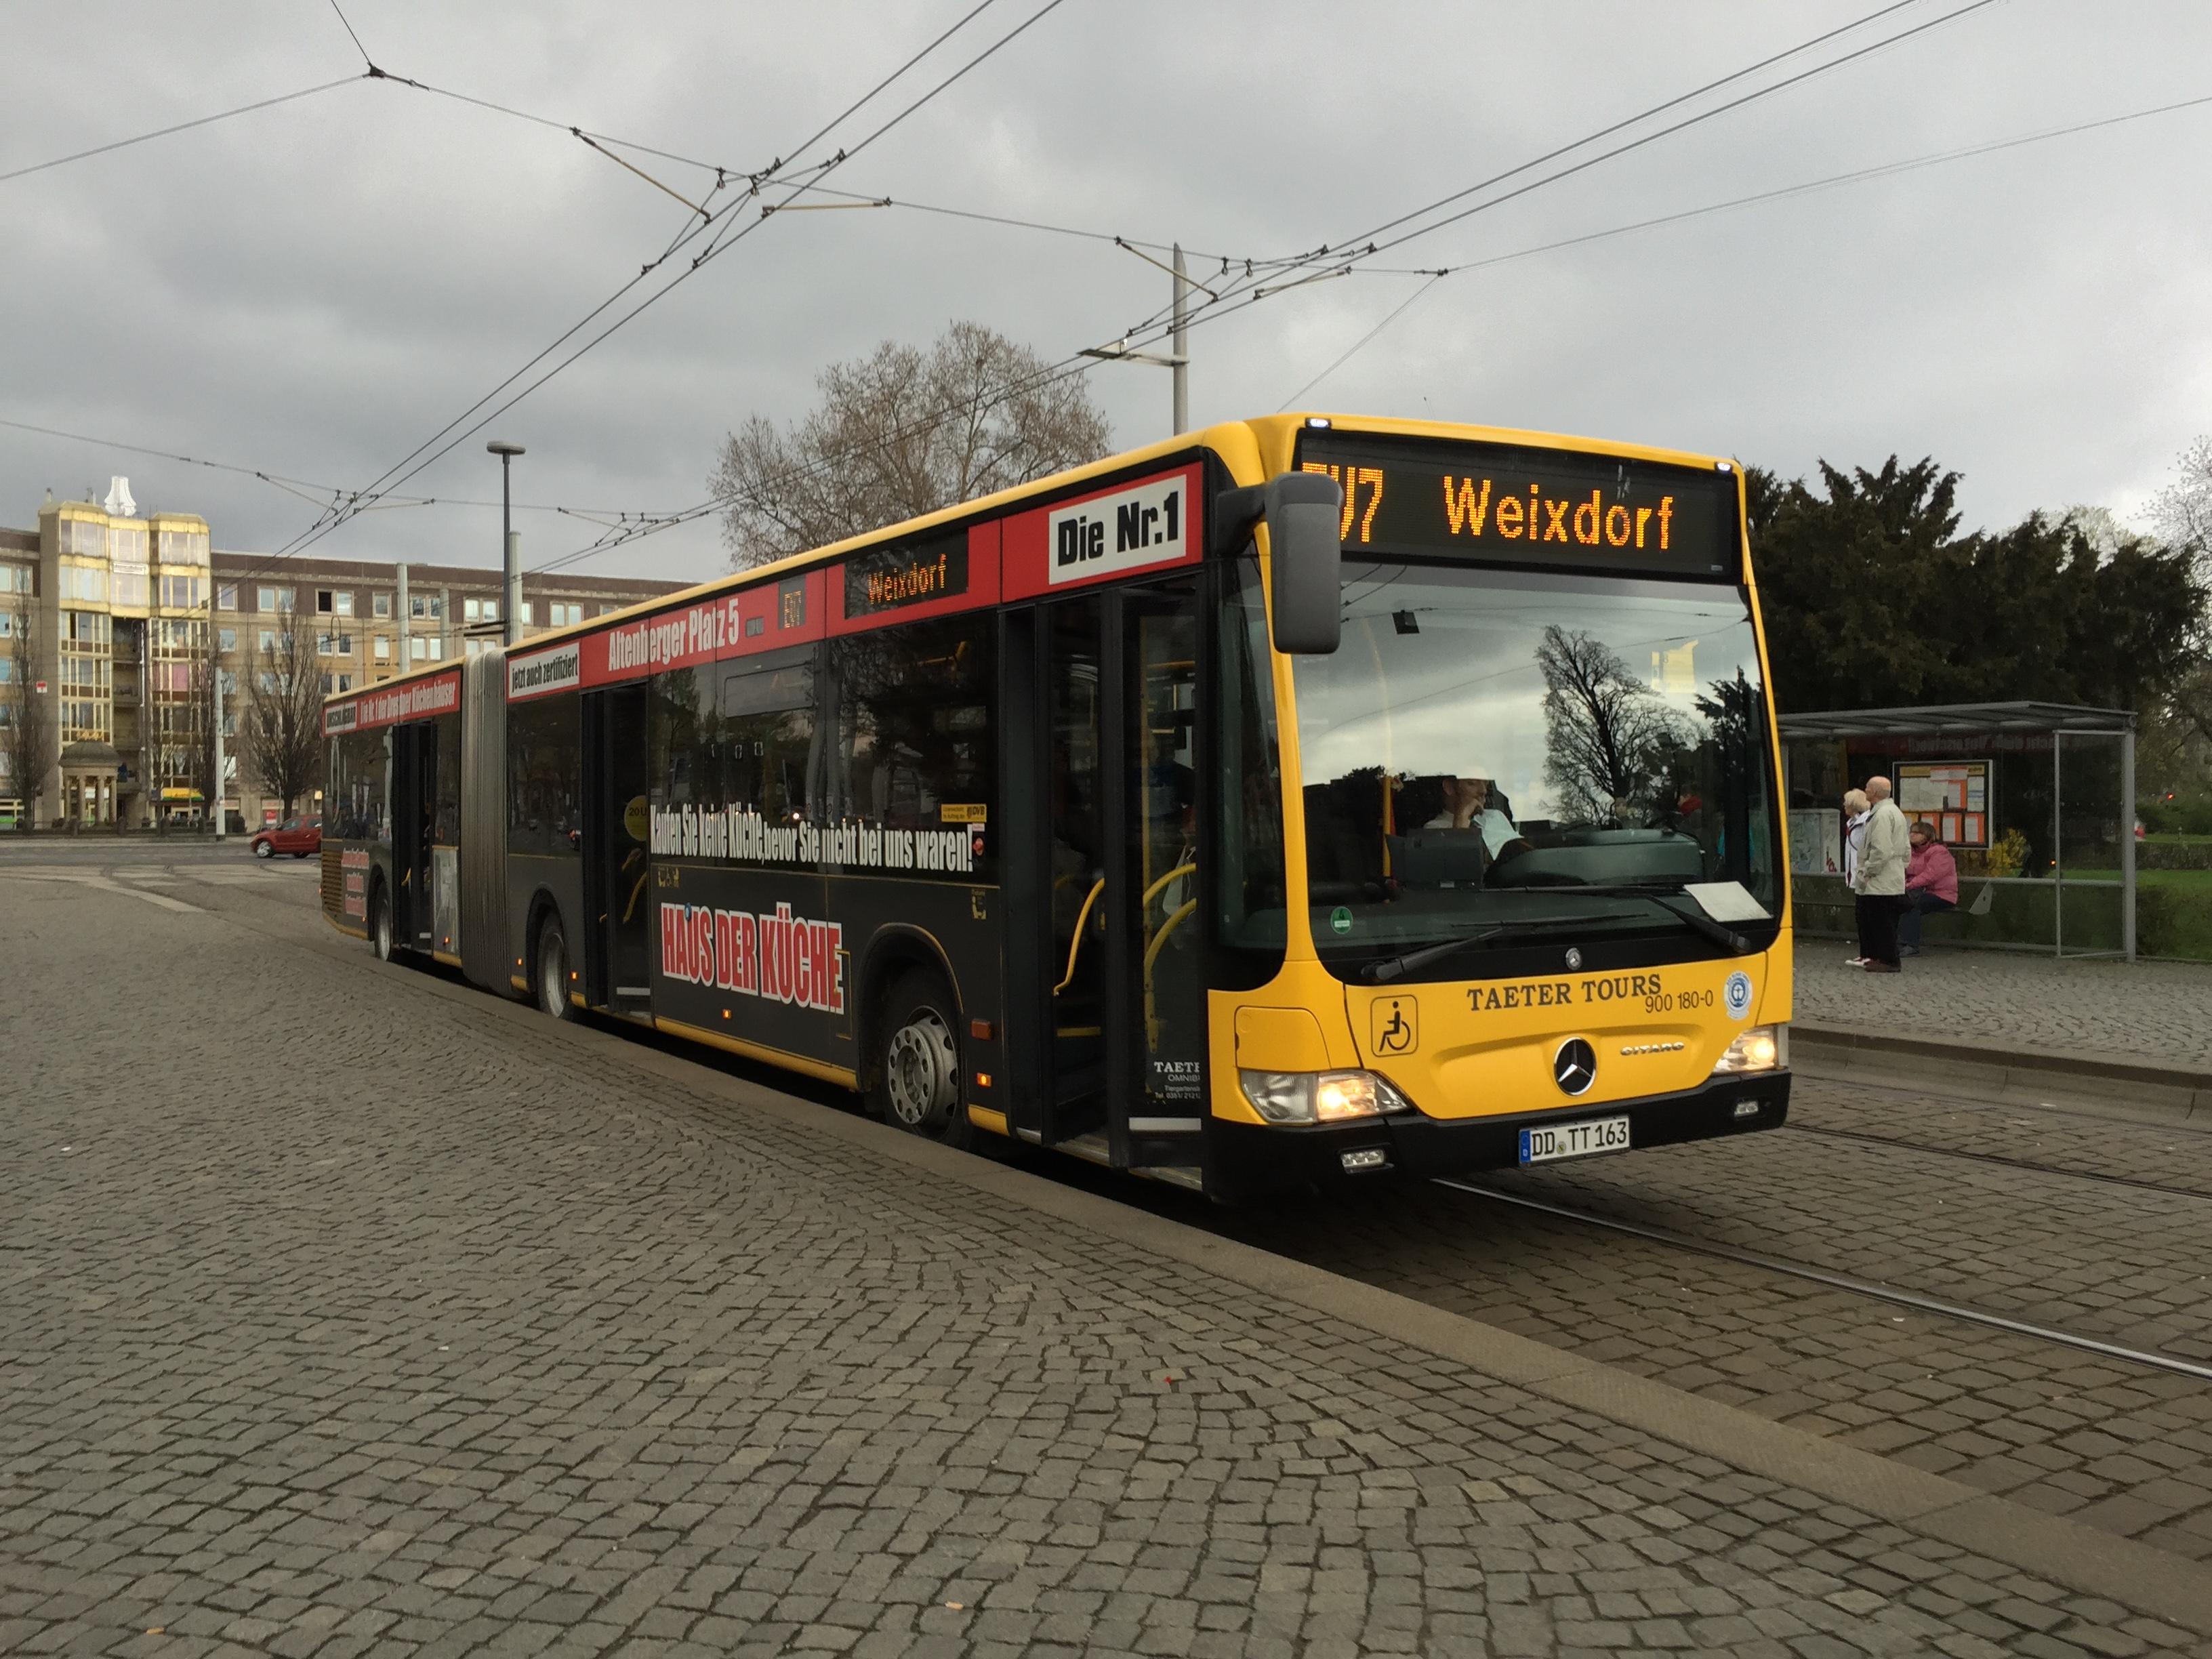 file taeter tours bus albertplatz dresden ev7 weixdorf jpg wikimedia commons. Black Bedroom Furniture Sets. Home Design Ideas